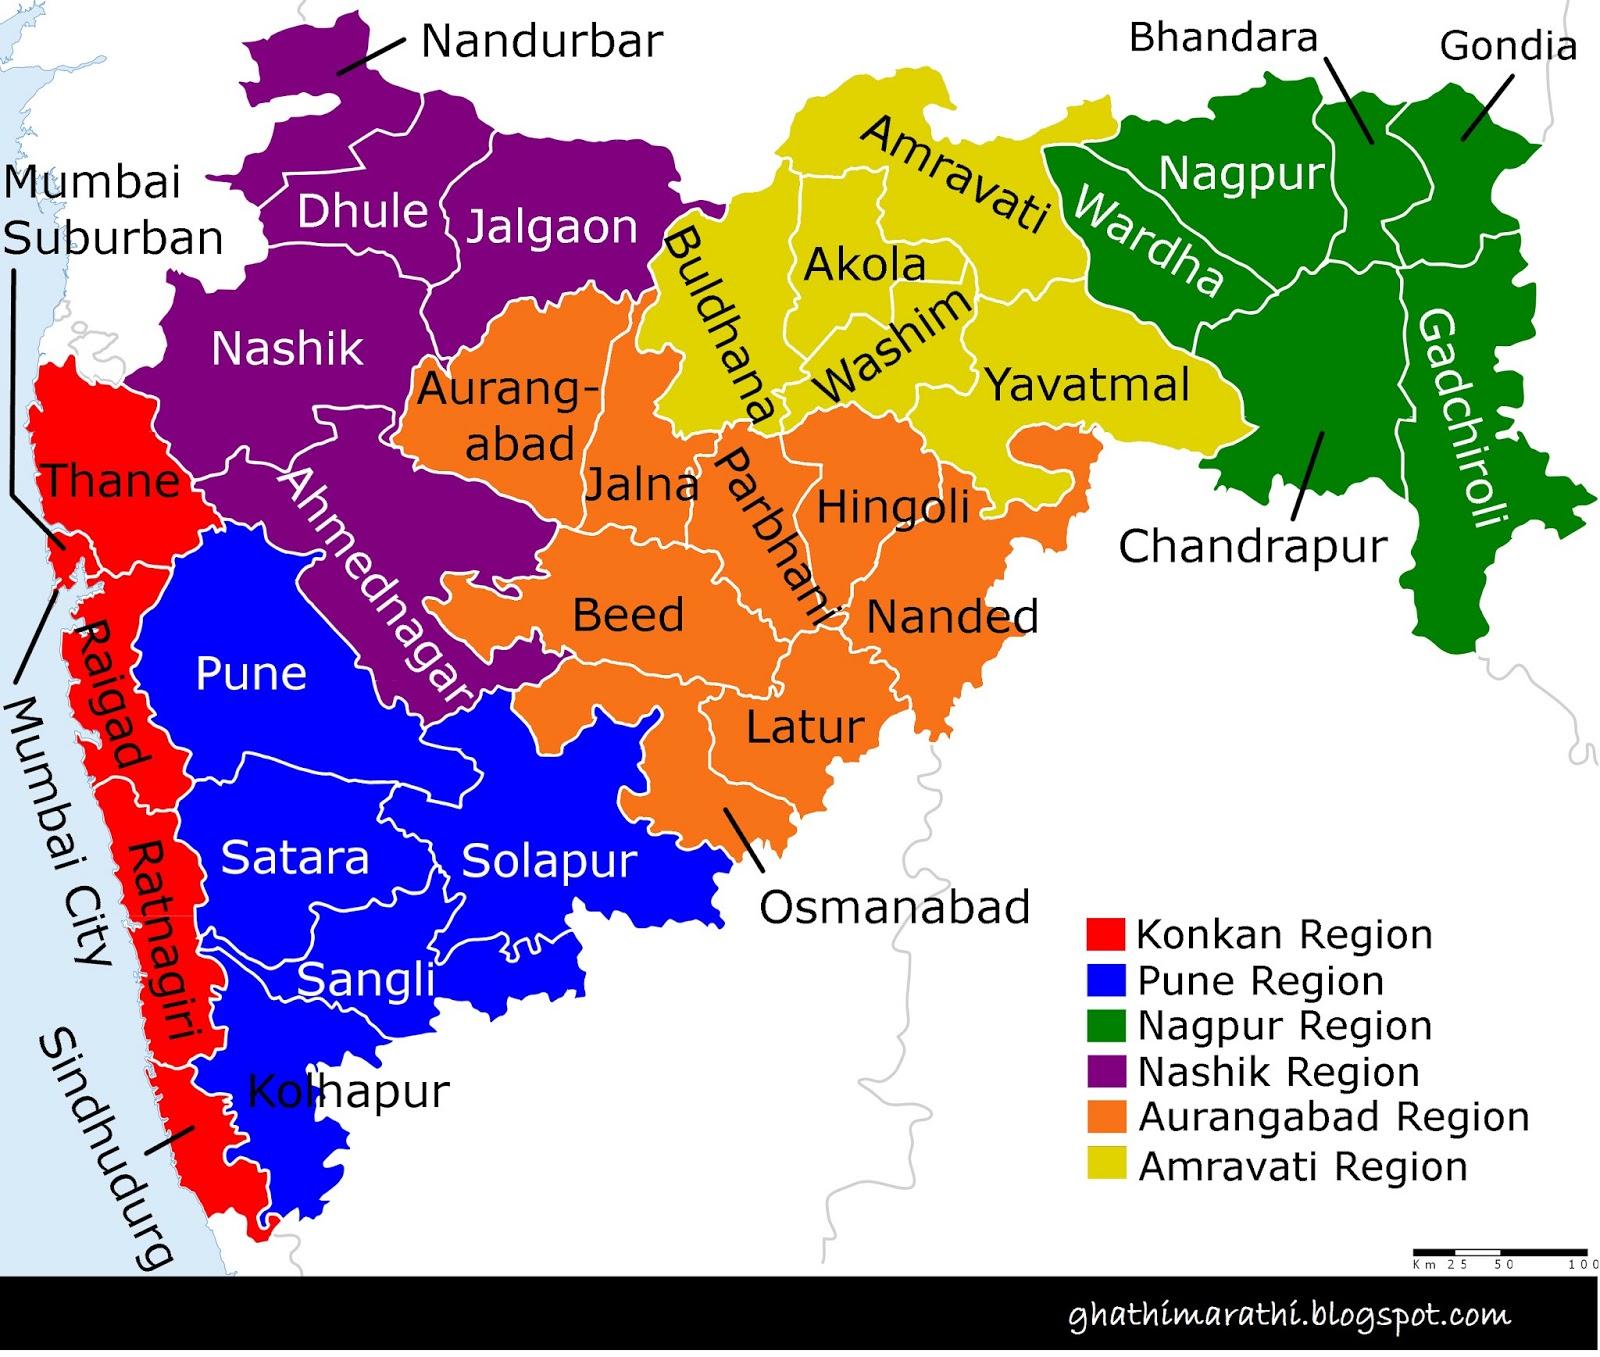 maharashtra state map with district in marathi language for tourism   marathi kavita sms jokes